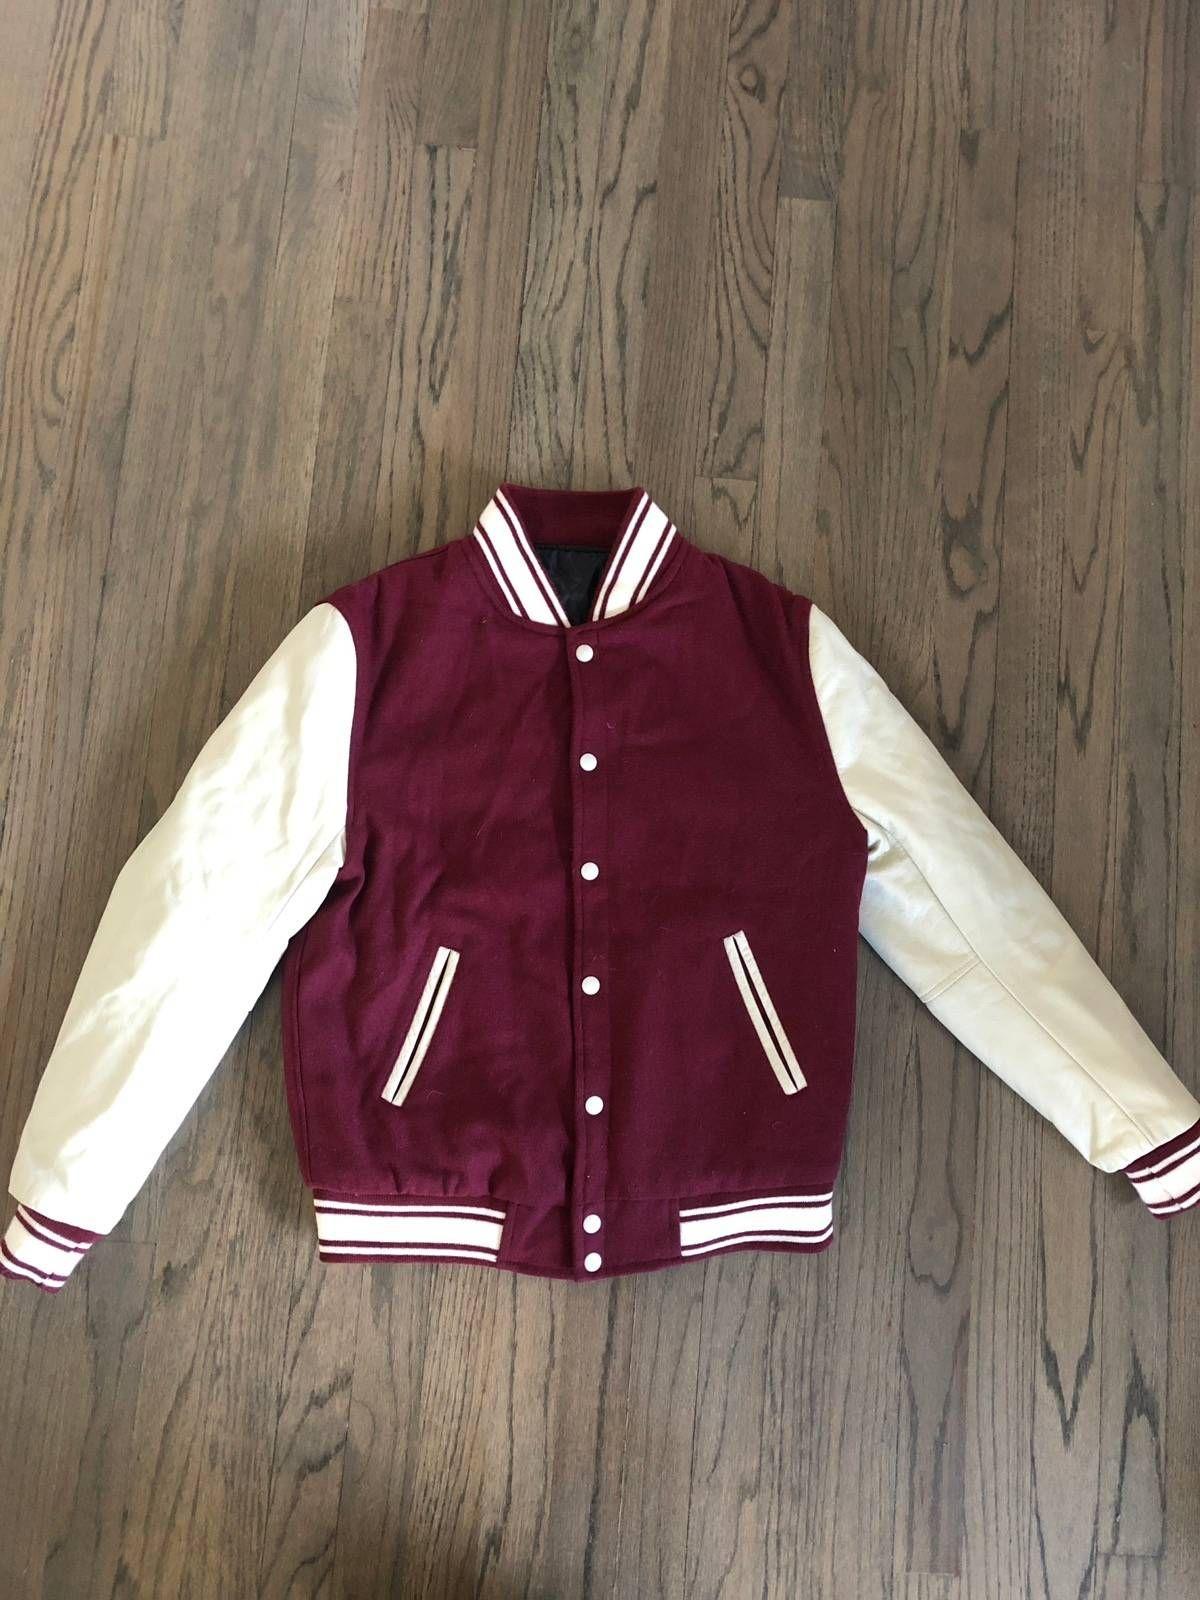 Searching For Winter Varsity We Ve Got Temple Of Jawnz Outerwear Starting At 350 And Plenty Varsity Style Shirt Varsity Jacket Outfit Custom Varsity Jackets [ 1600 x 1200 Pixel ]